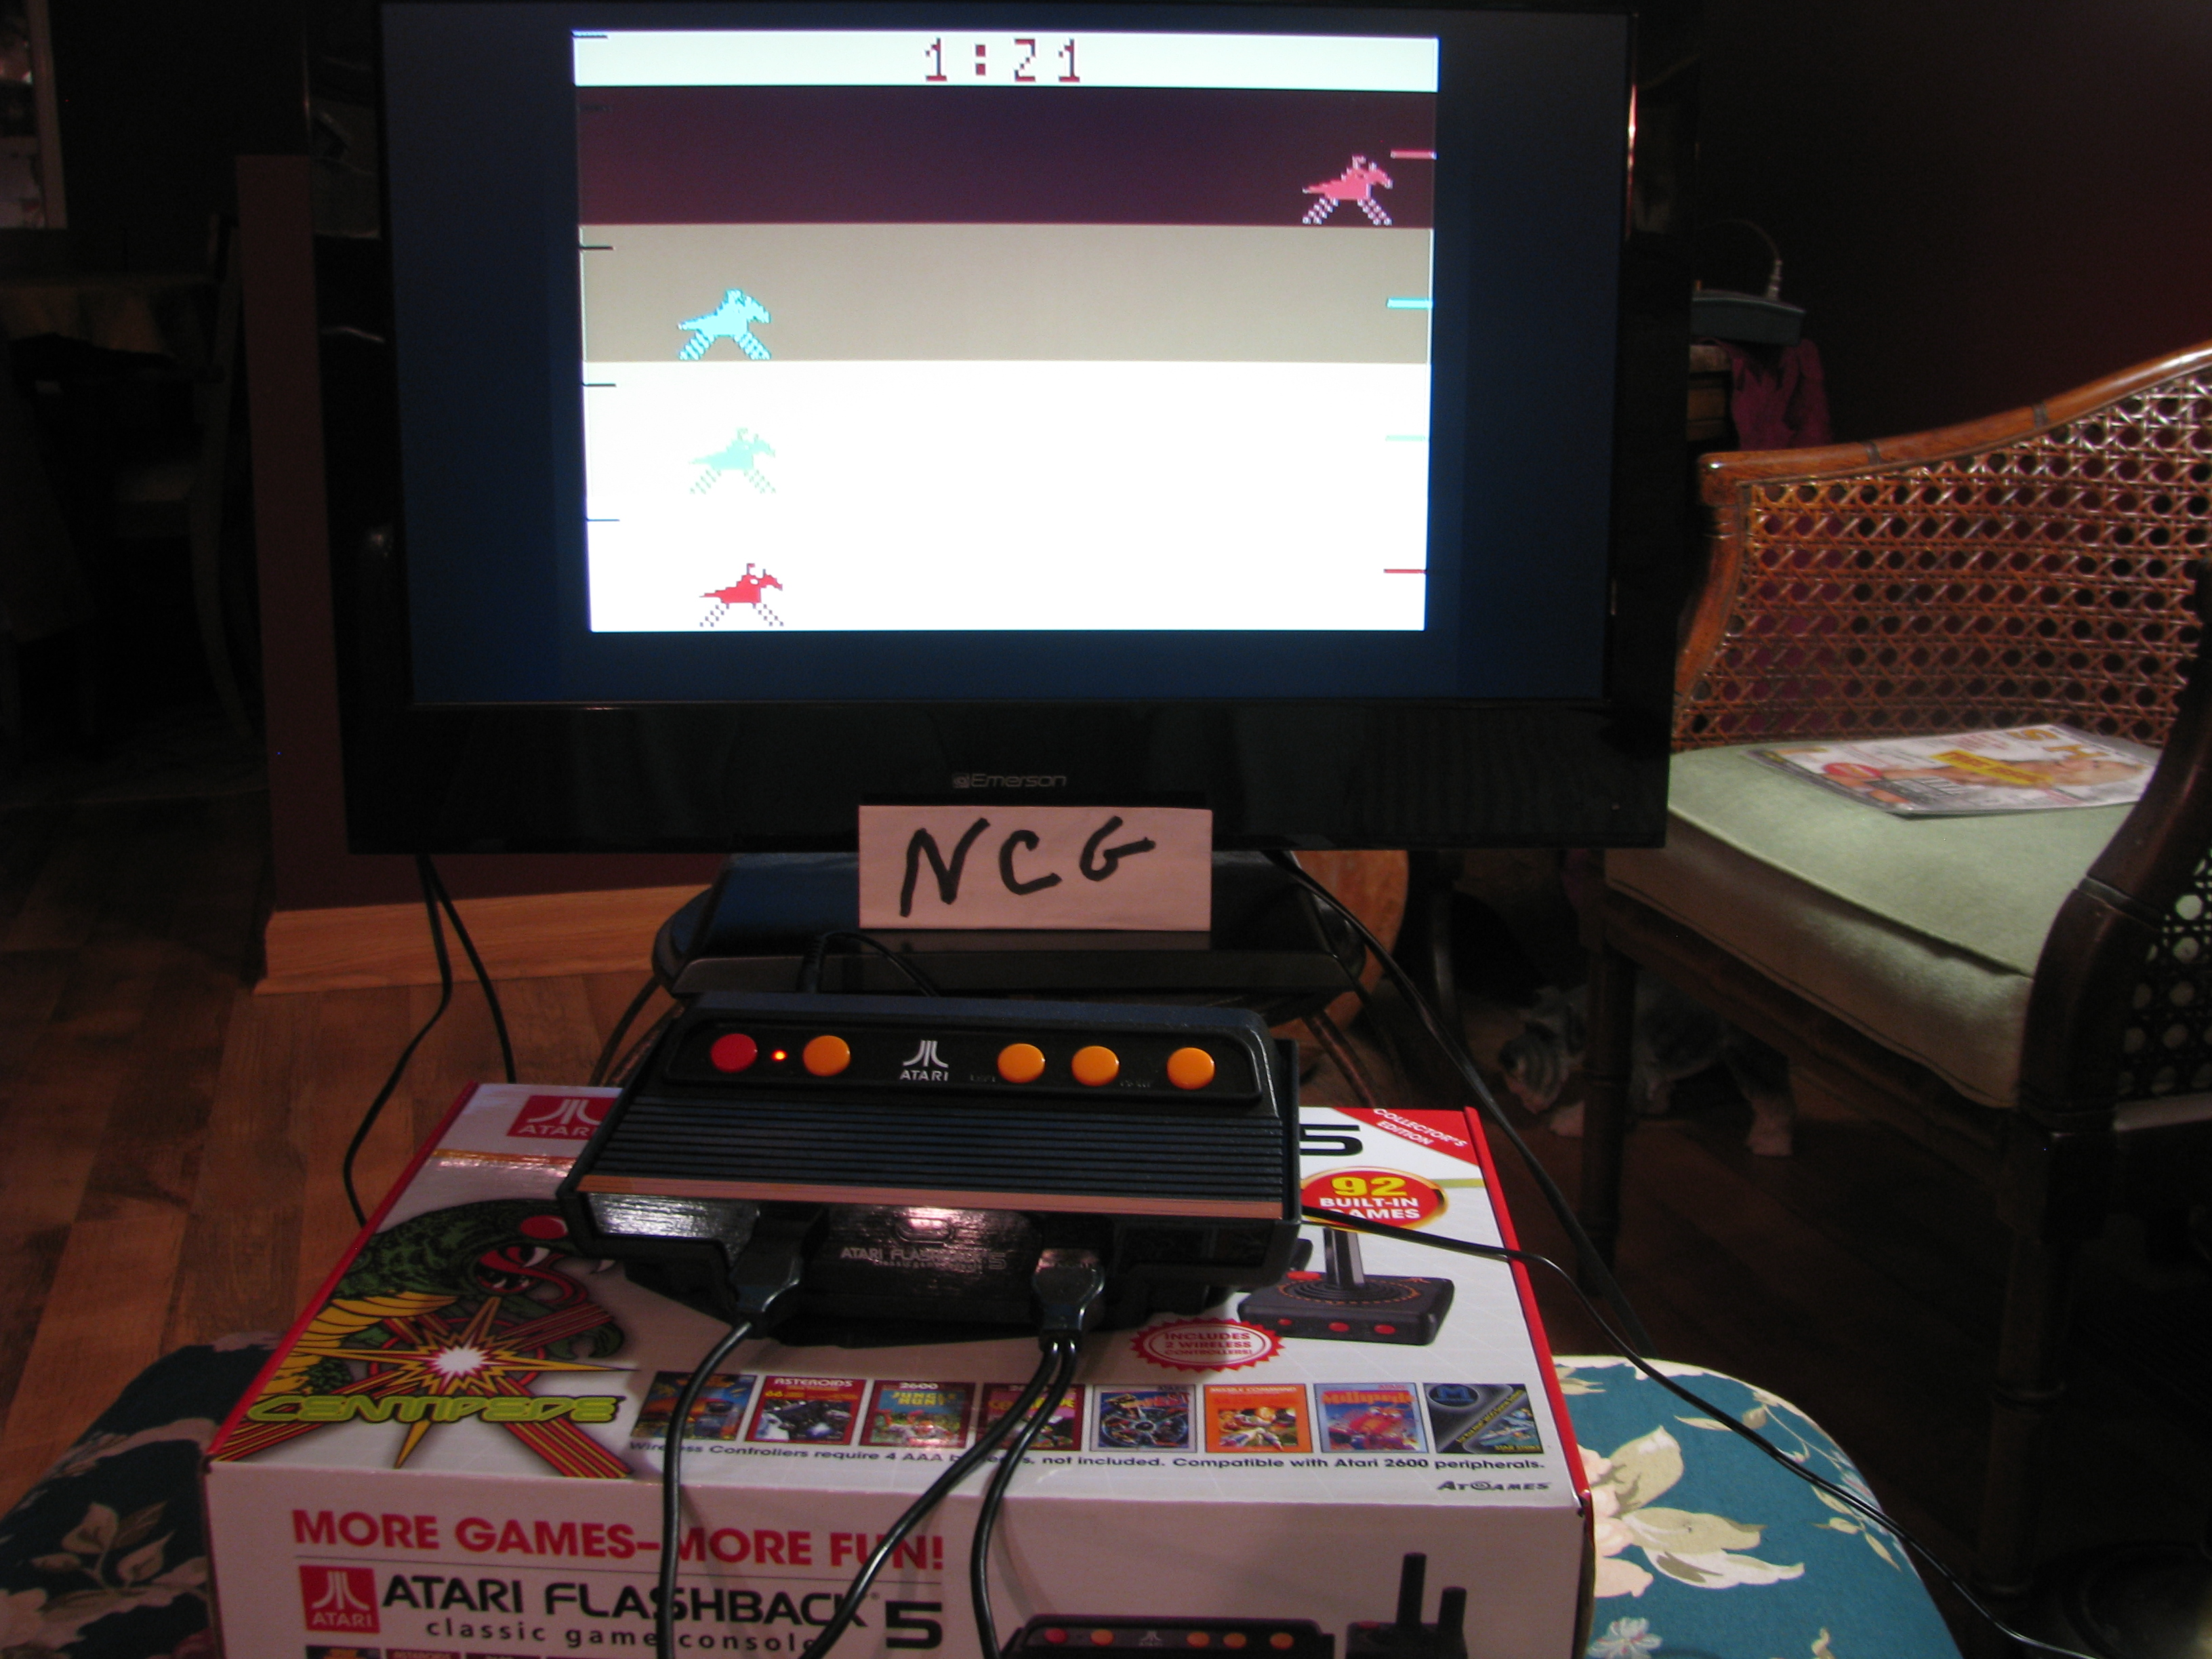 NorthCoastGamer: Steeplechase (Atari Flashback 5) 0:01:21 points on 2015-01-12 10:04:07